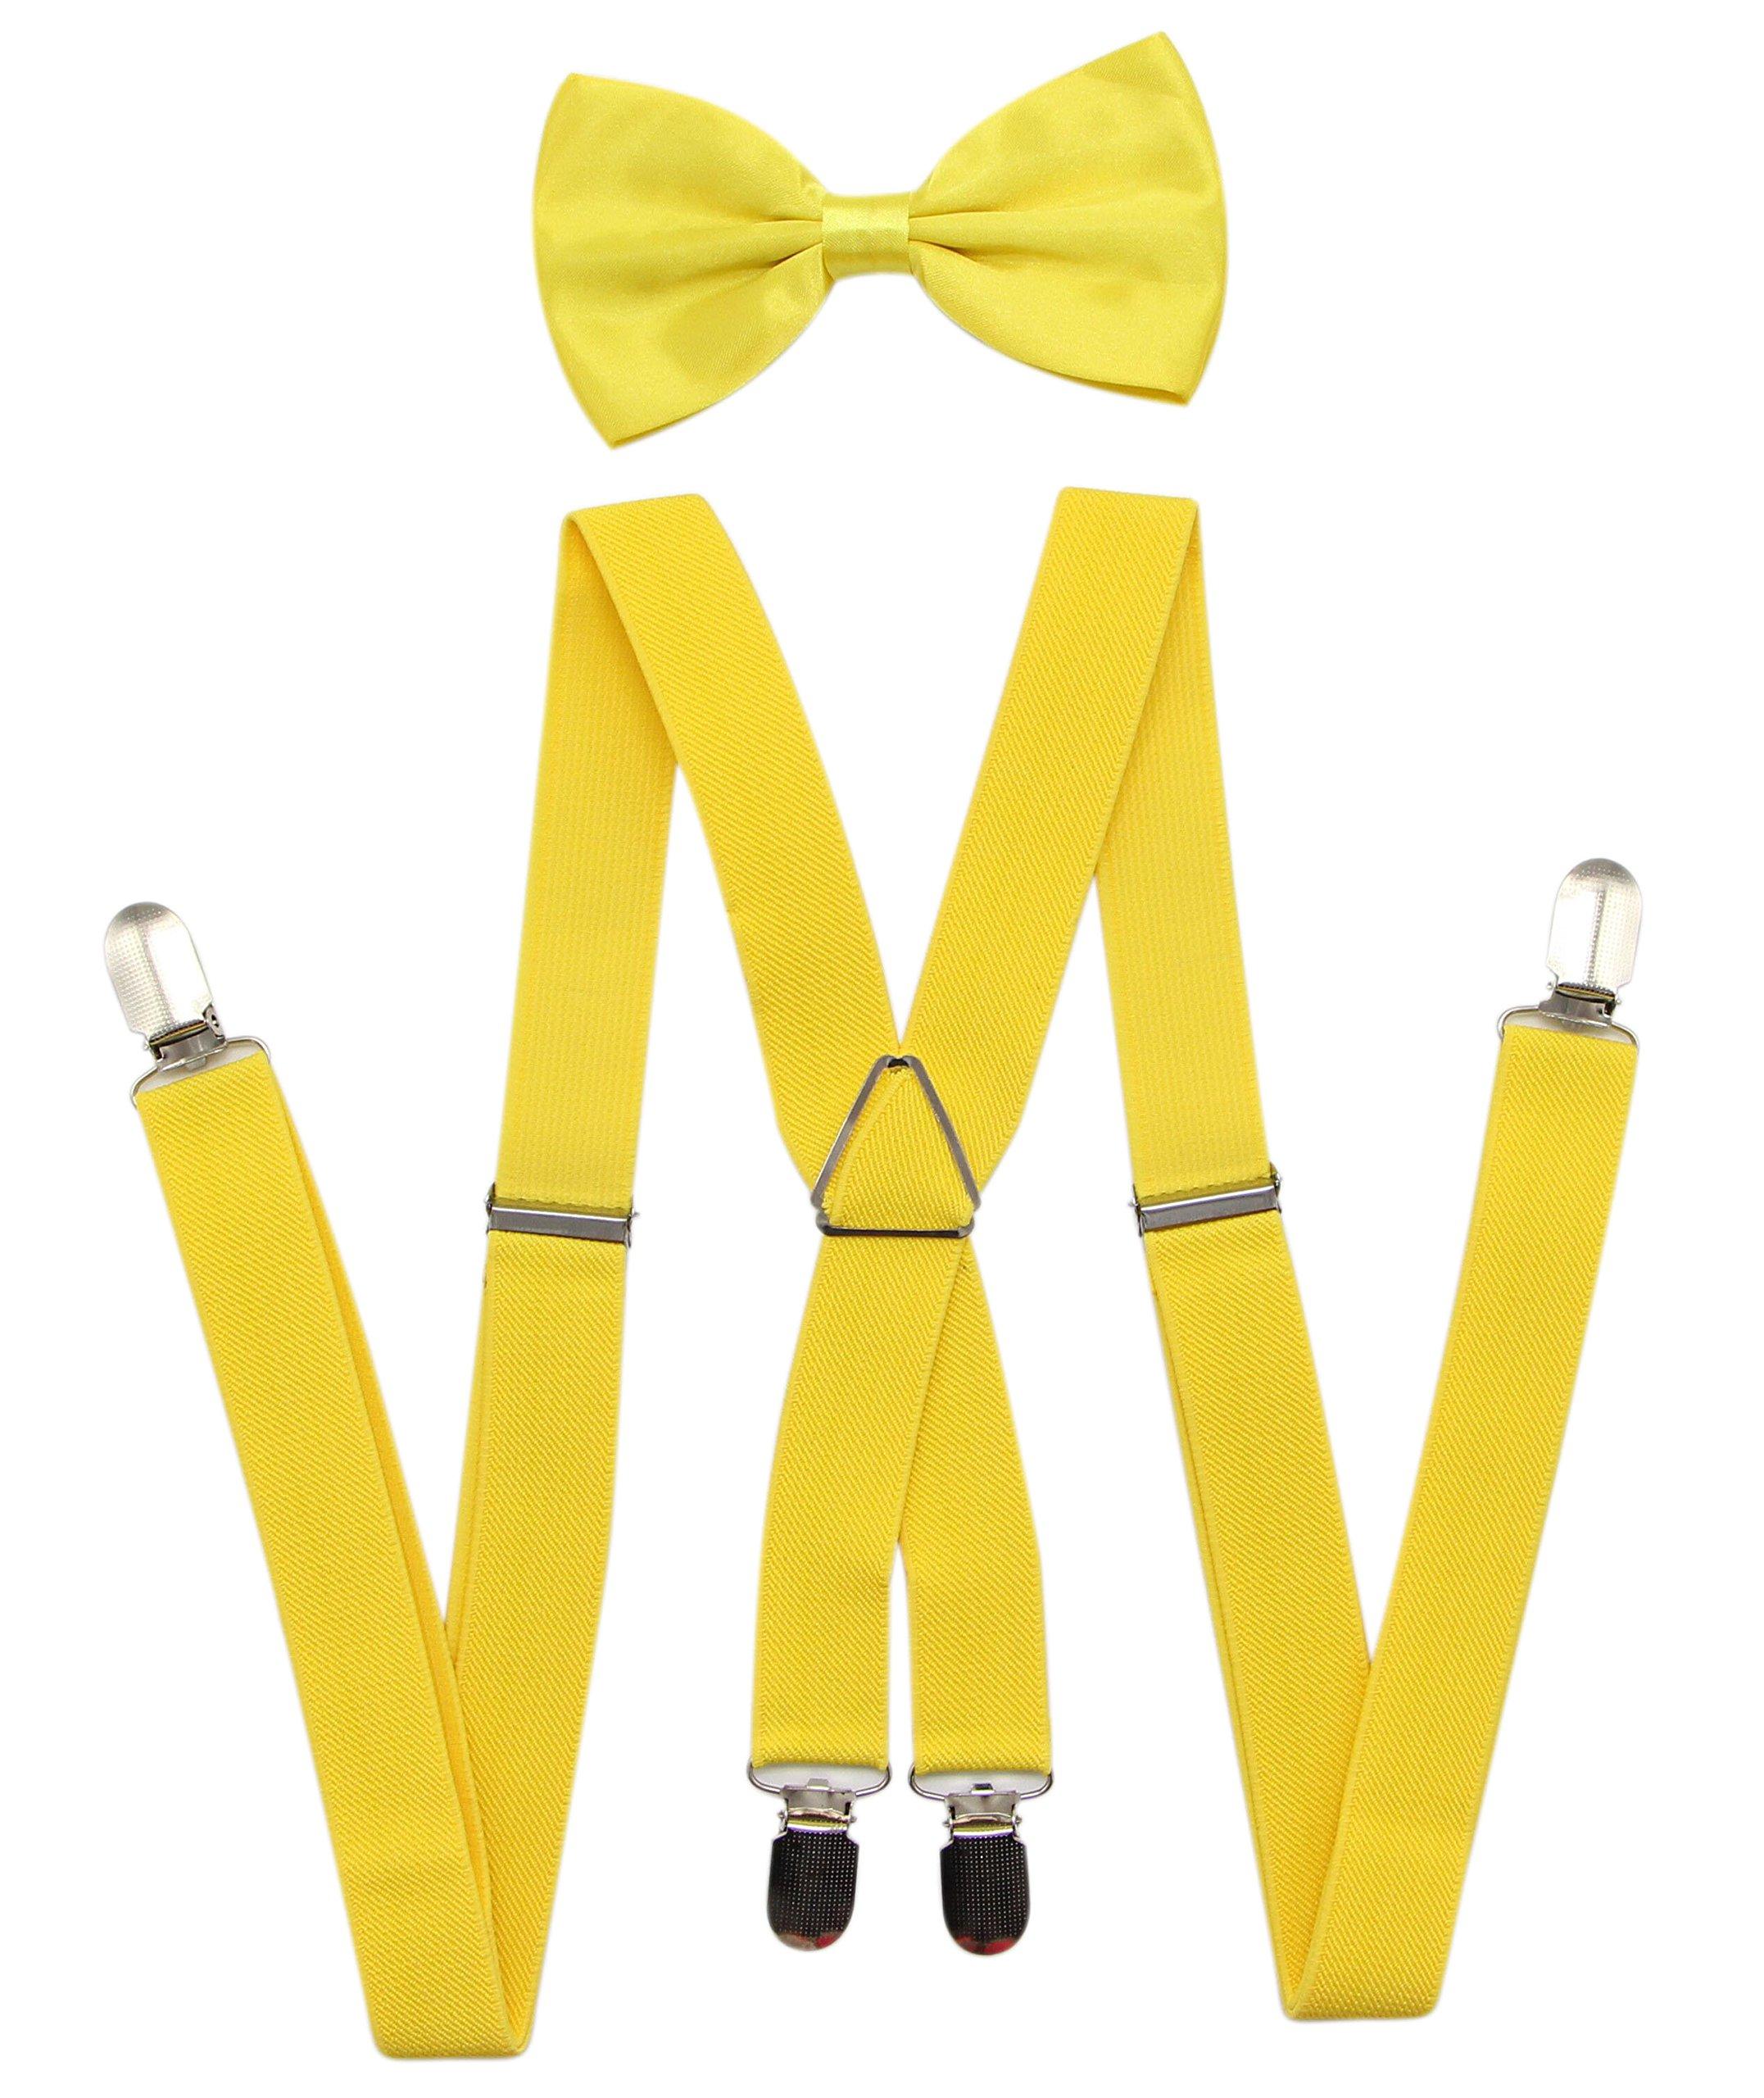 JAIFEI Men's Suspenders & Bowtie Set - Perfect For Weddings & Formal Events (Yellow)